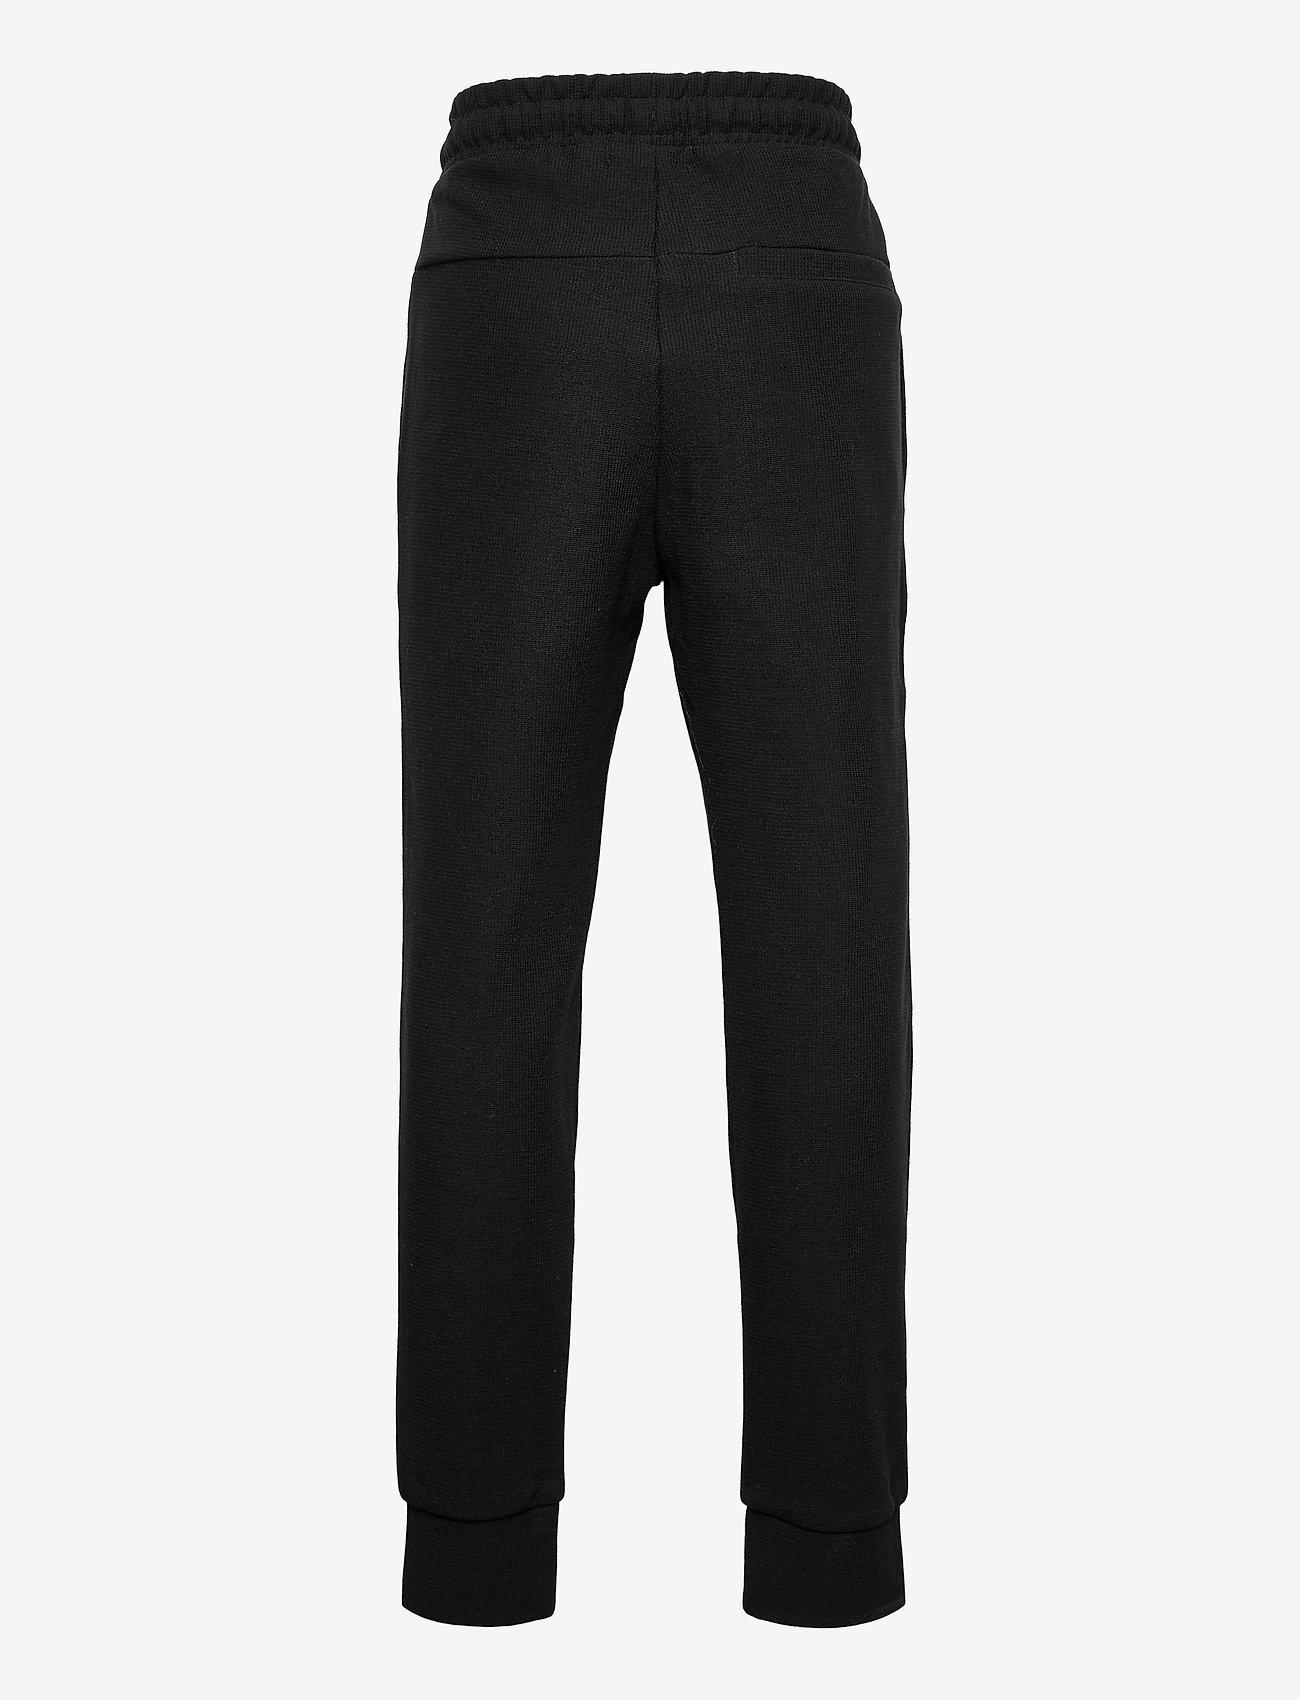 LMTD - NLMROLAND SWEAT PANT - jogginghosen - black - 1